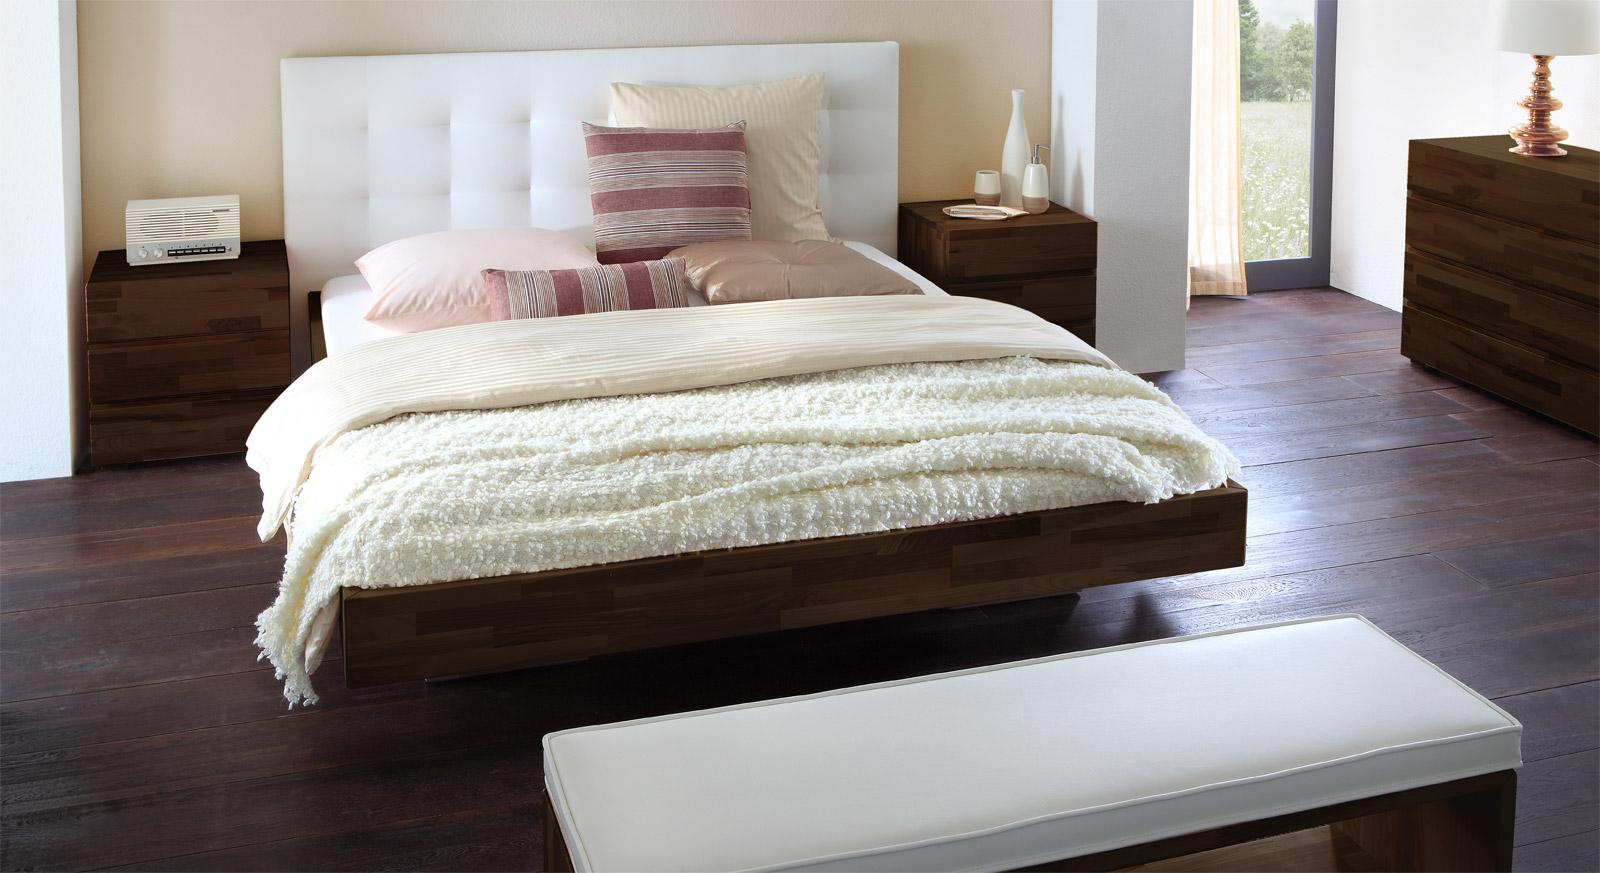 Massivholzbett mit Wandpaneel als hohes Kopfteil - Bianco Deluxe